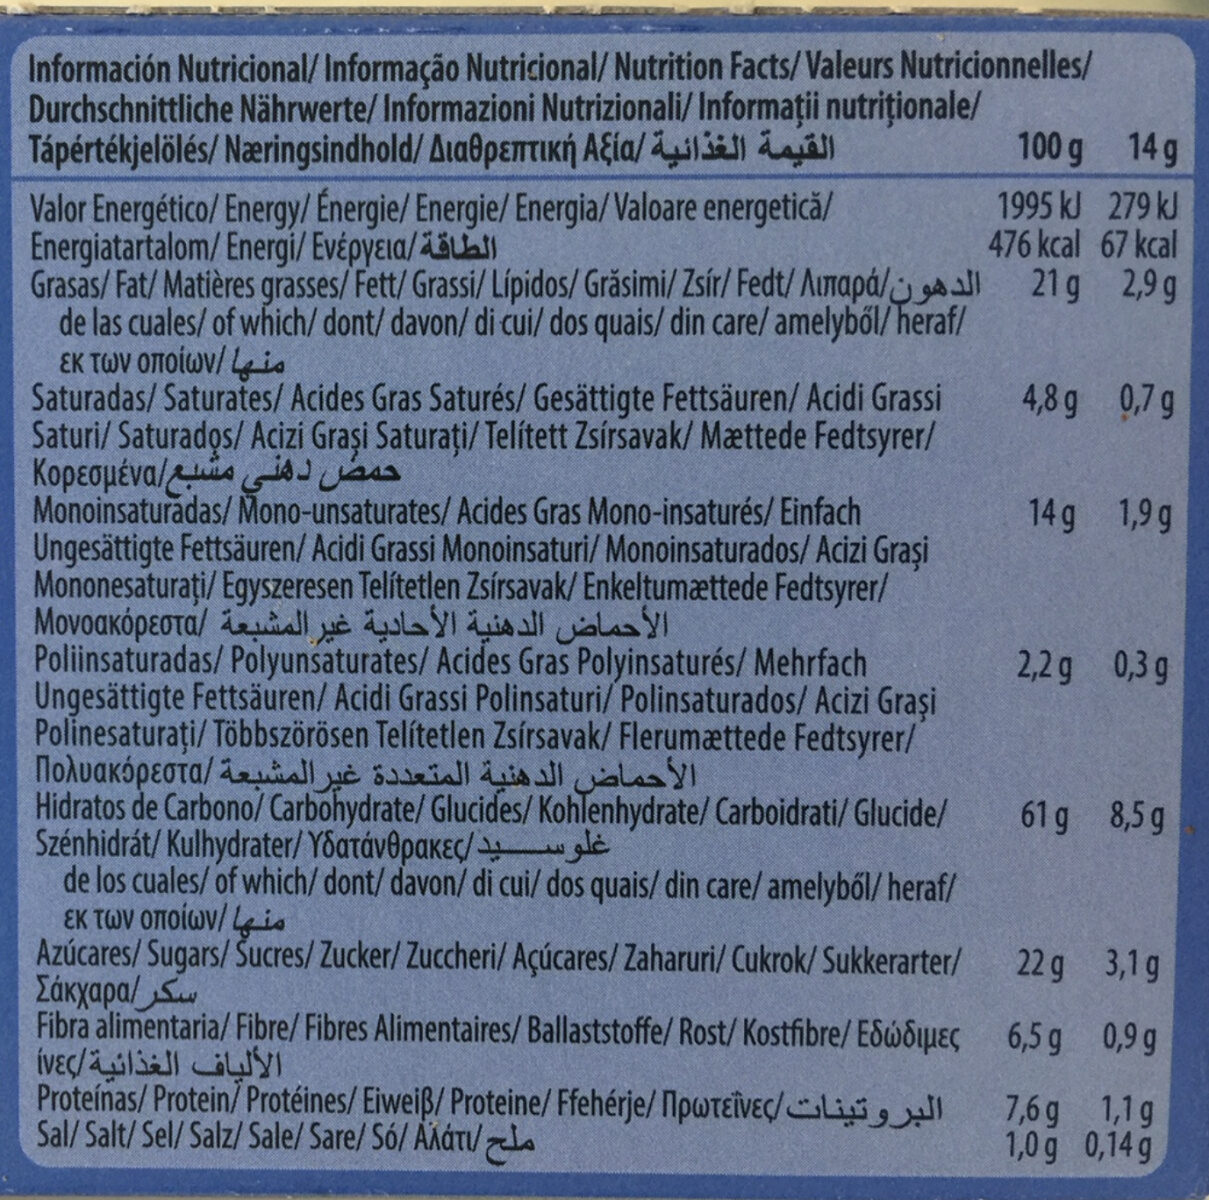 Galletas Digestive Avena choco - Informations nutritionnelles - en